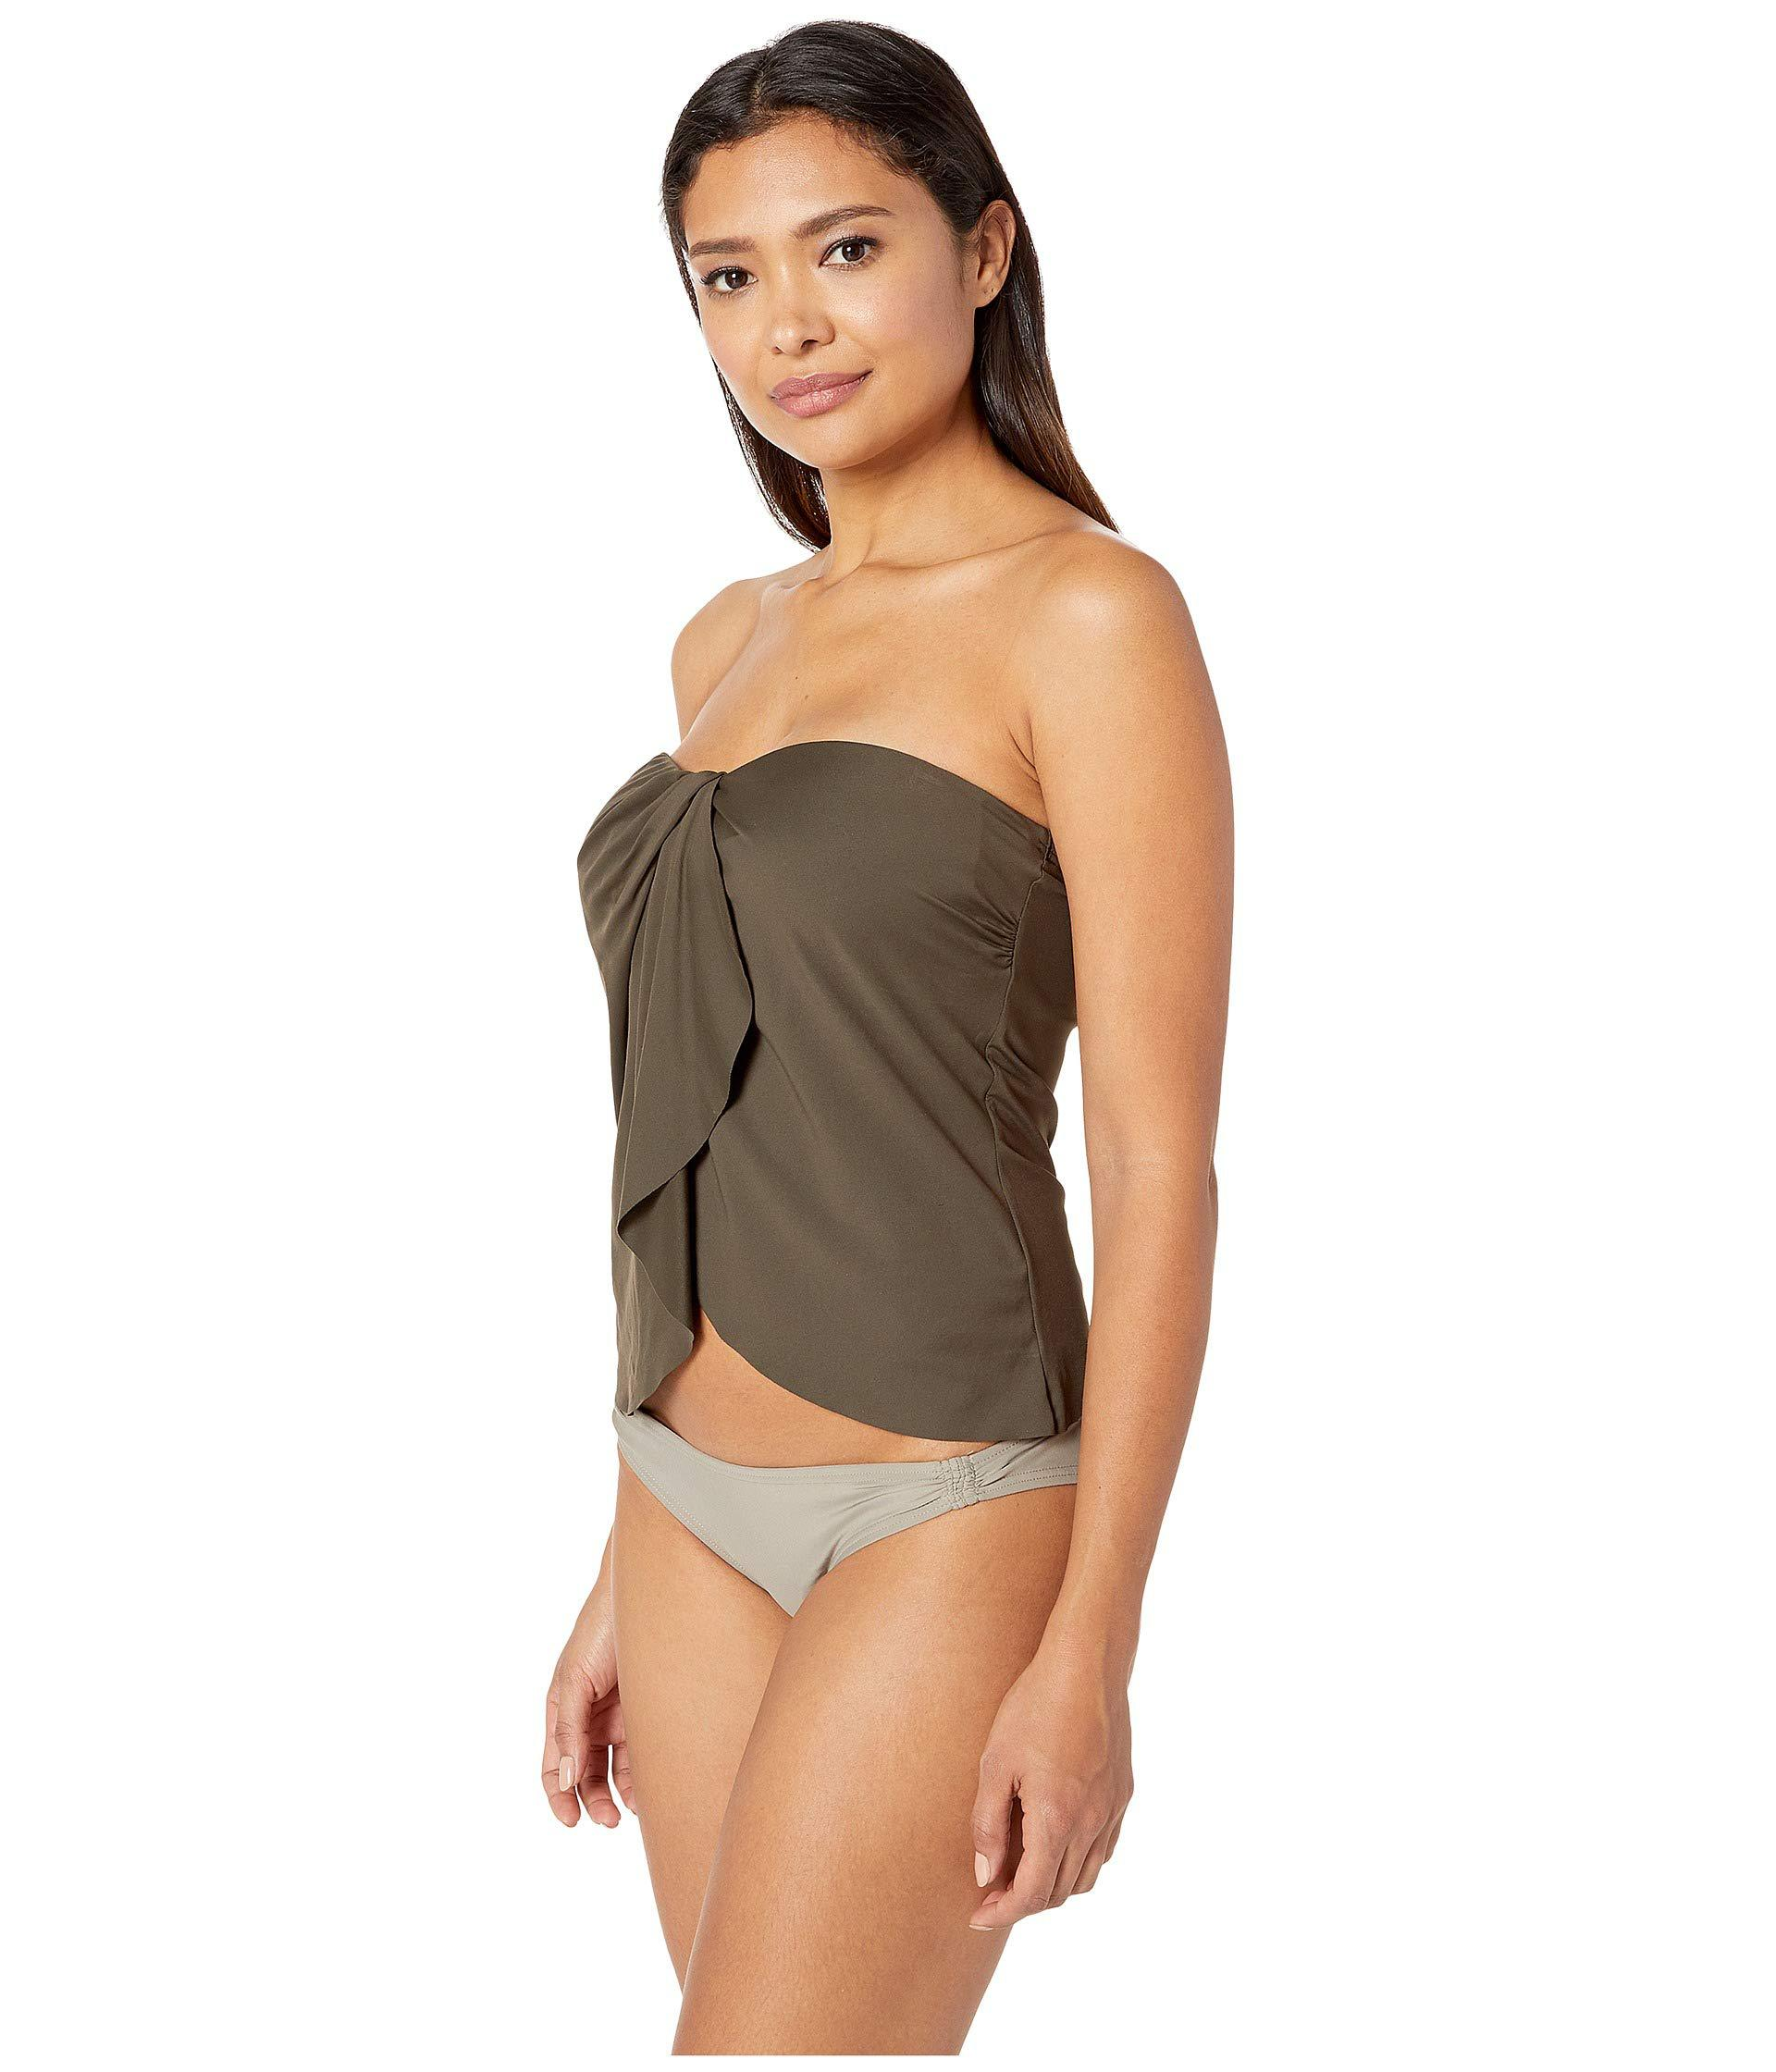 8b4963e43f9 Lyst - Vince Camuto Surf Shades Draped Bandini Top (koi) Women's Swimwear